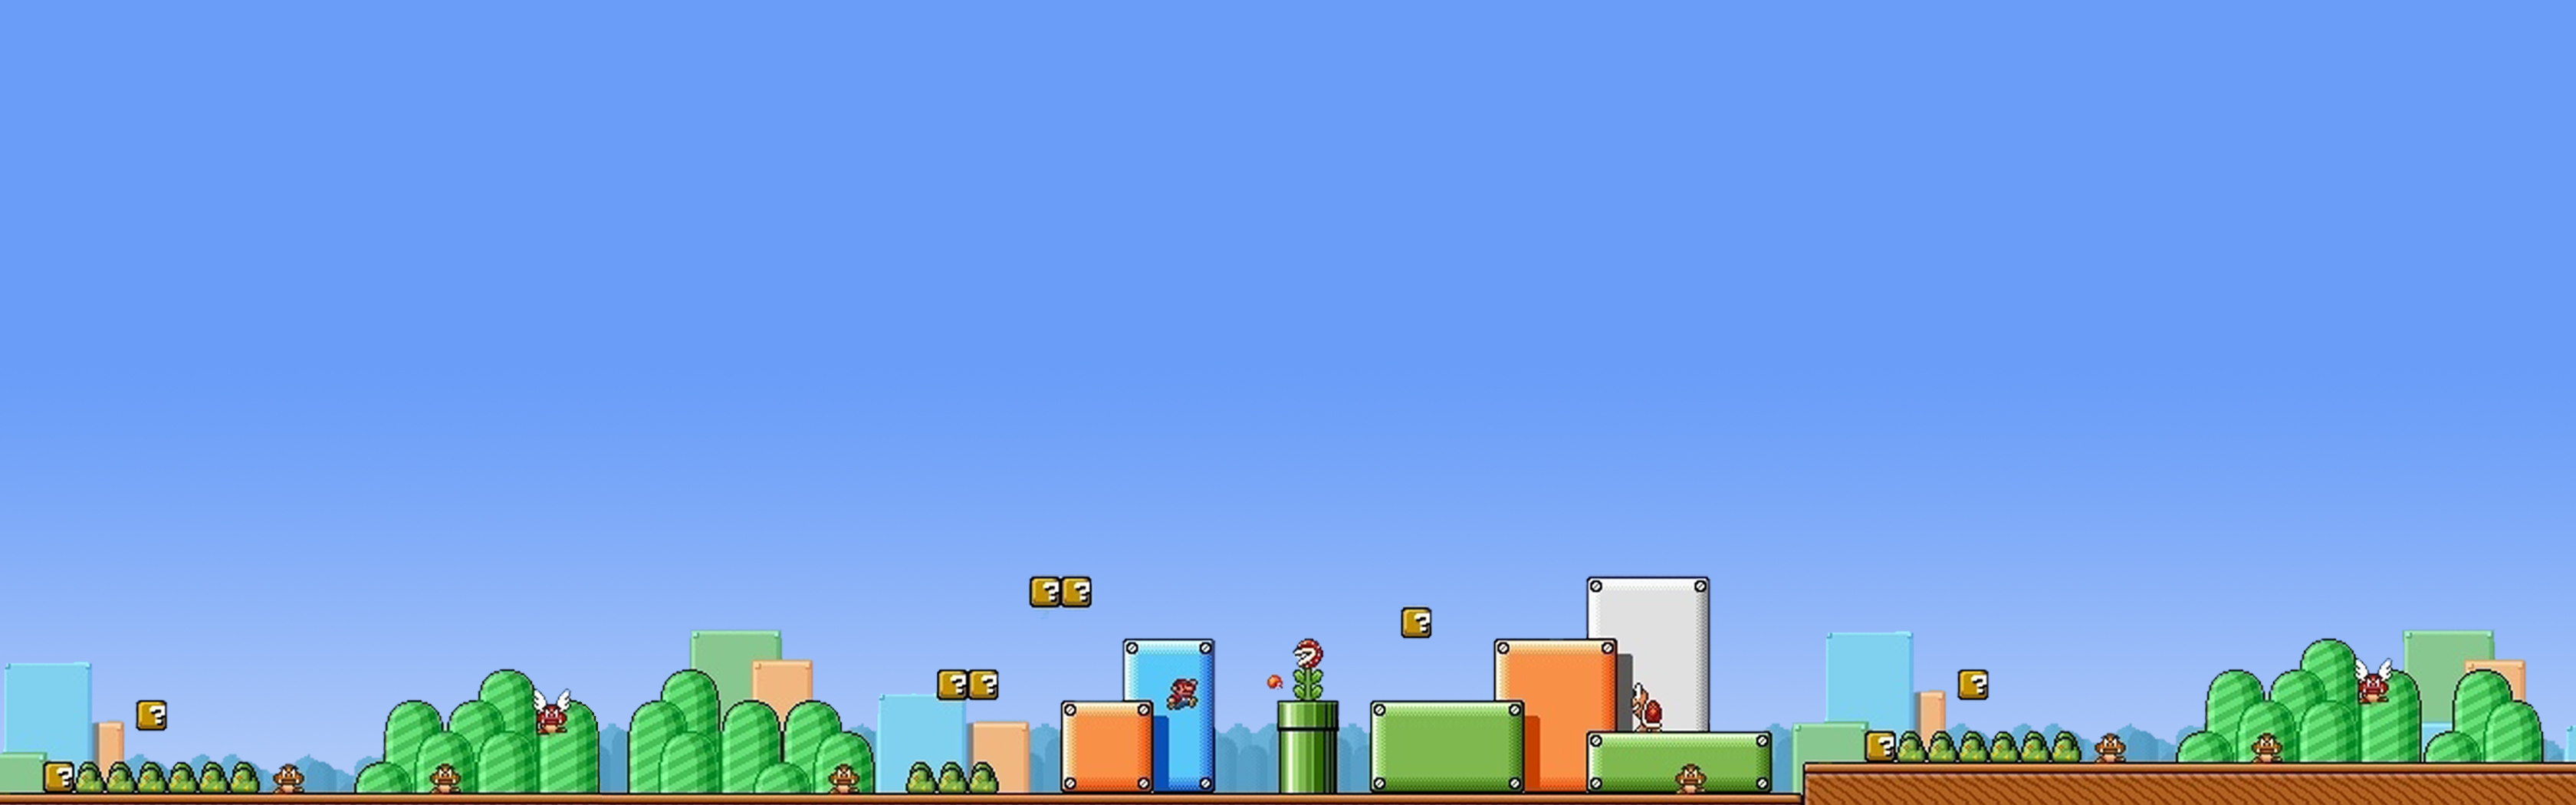 Super Mario Wallpaper by sylviaK86 on DeviantArt